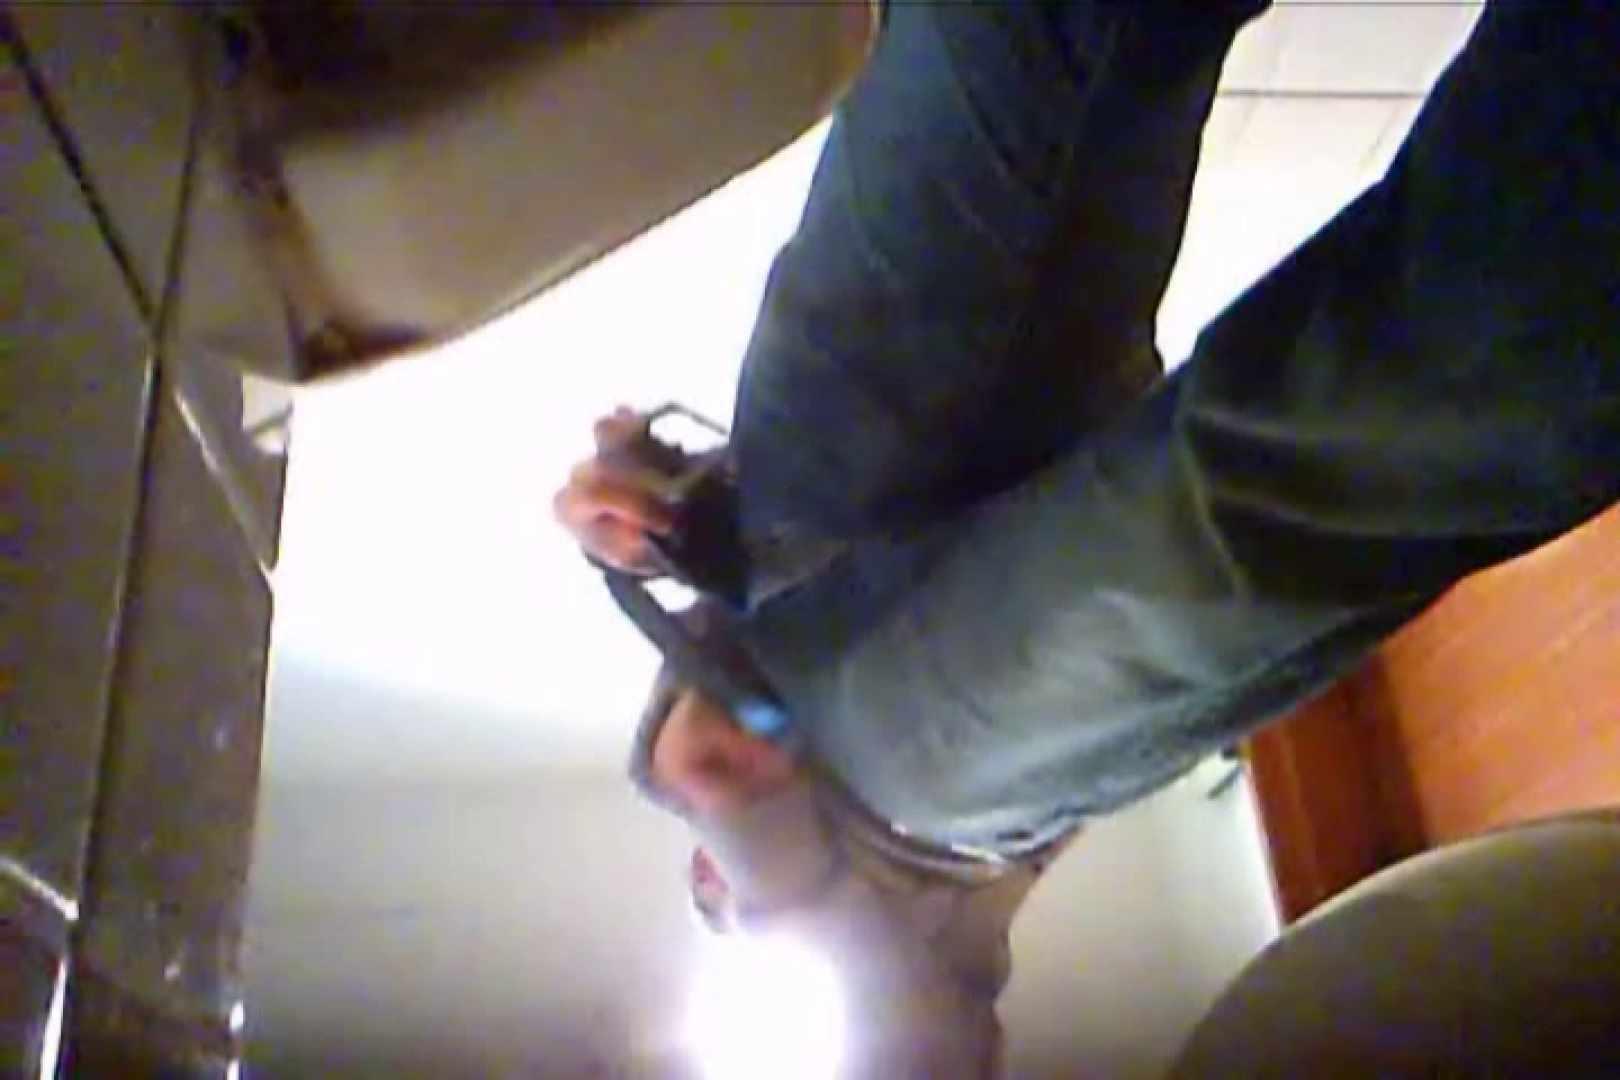 SEASON 2ND!掴み取りさんの洗面所覗き!in新幹線!VOL.03 スーツボーイズ | ボーイズ私服  76pic 56